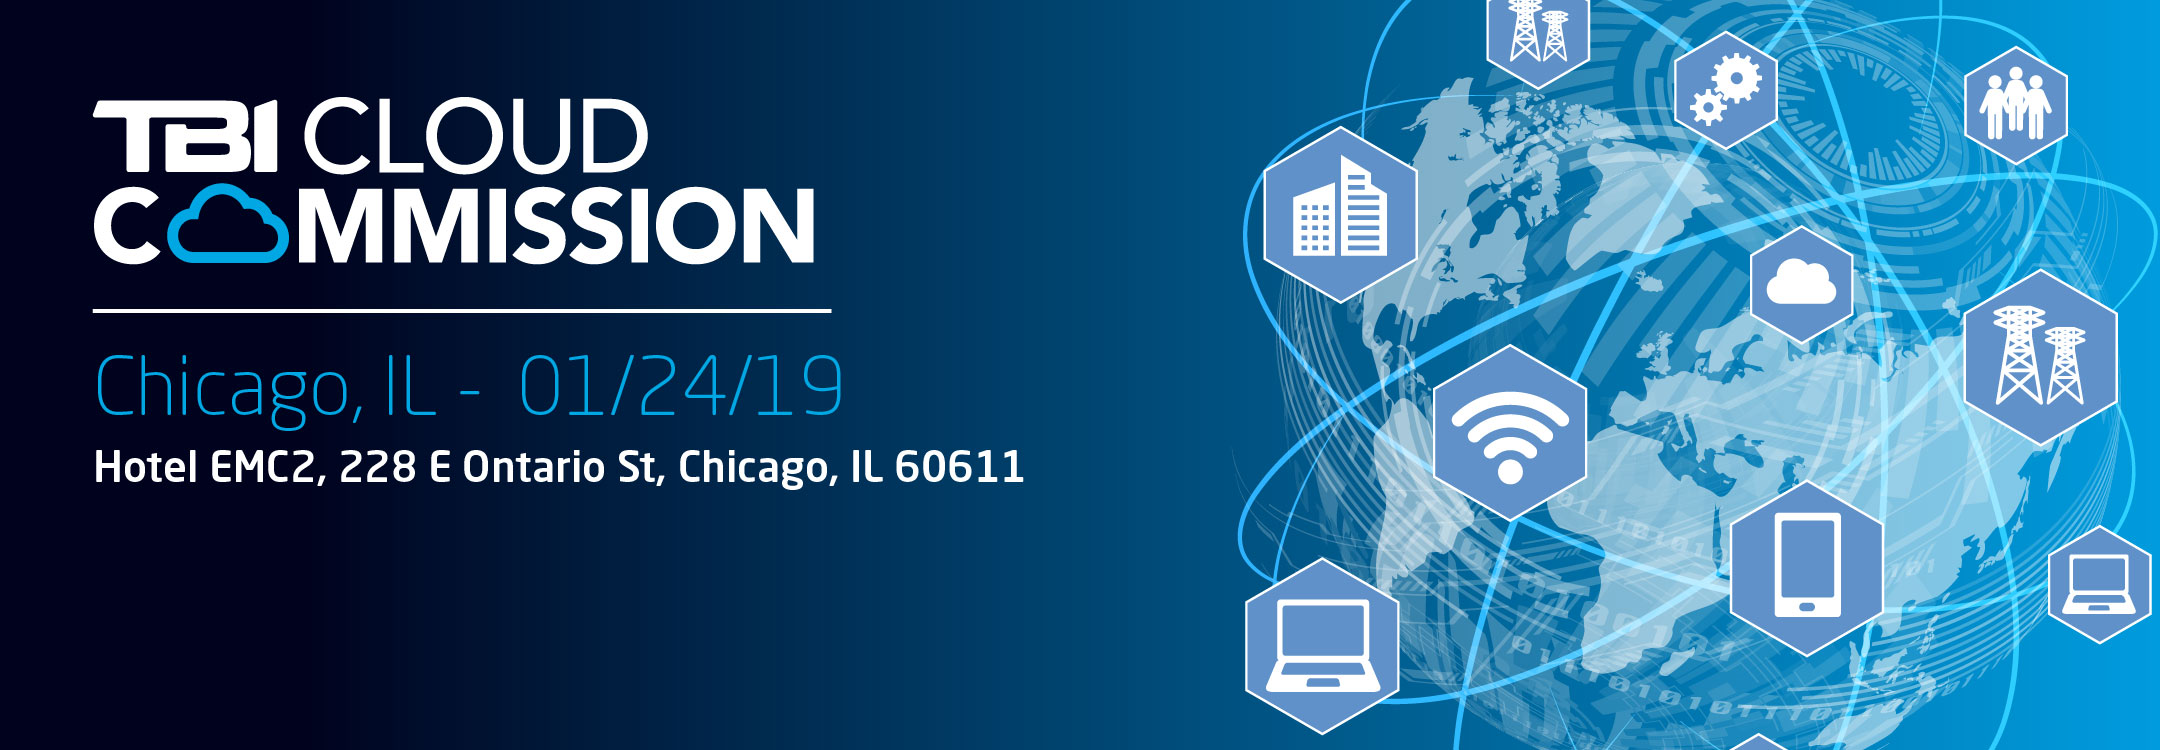 2018-11-28_TBI-Cloud-Commission_Chicago.jpg